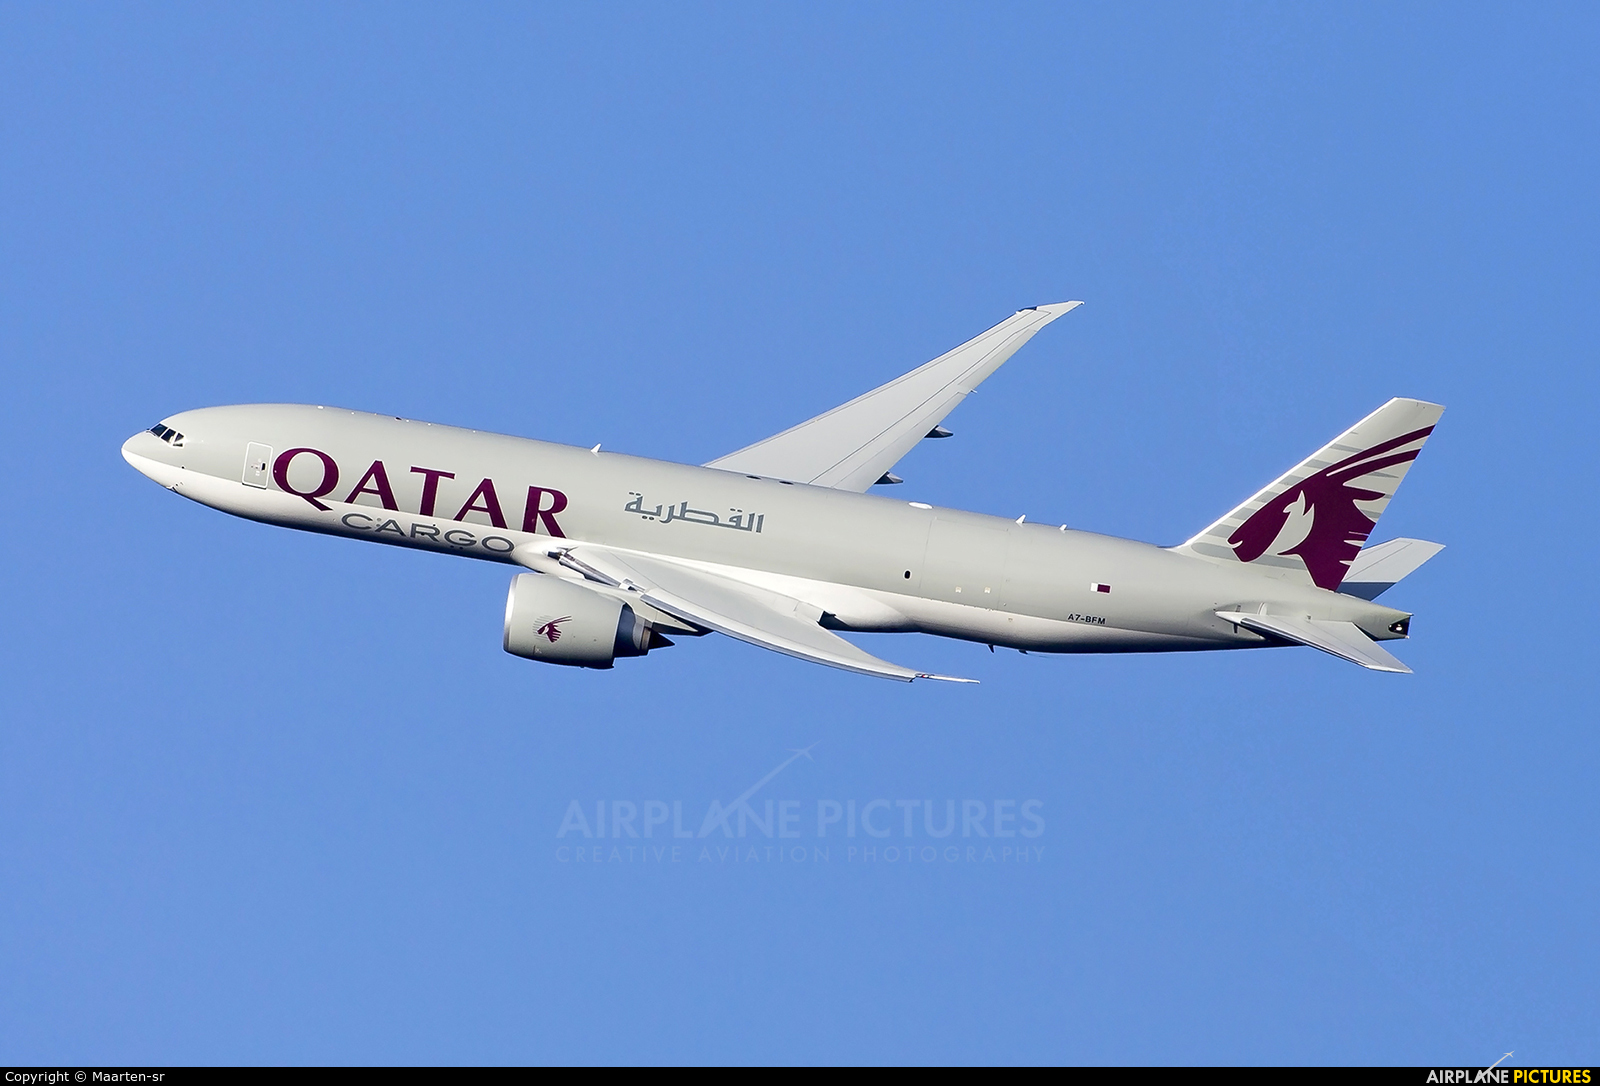 Qatar Airways Cargo A7-BFM aircraft at Amsterdam - Schiphol